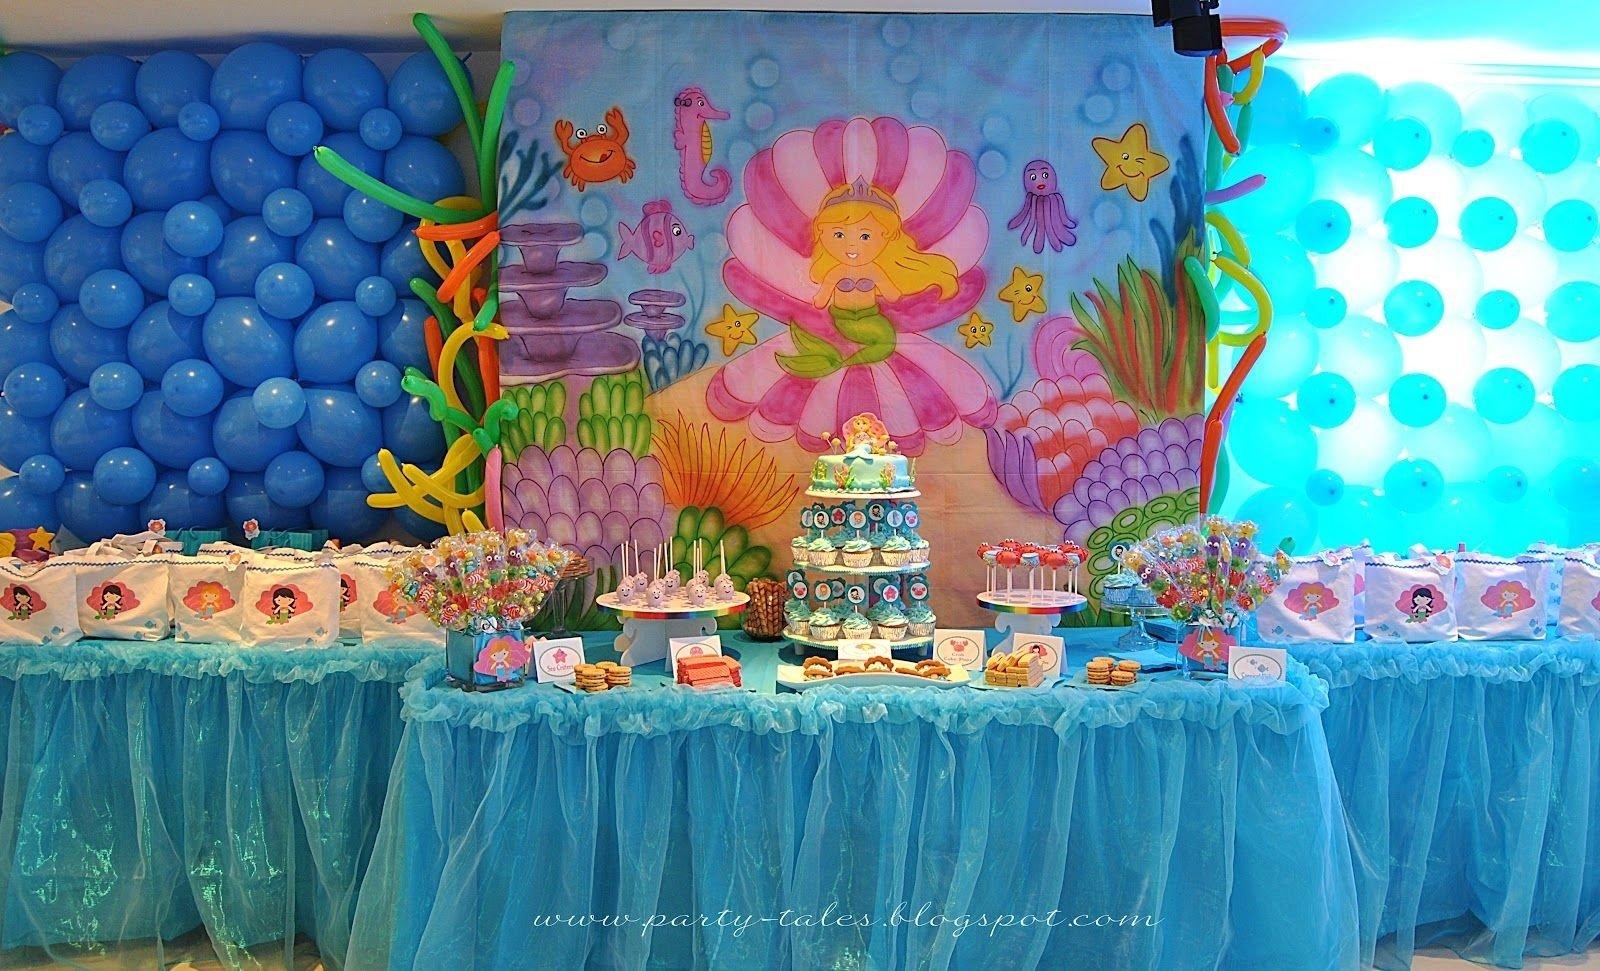 10 Stunning Under The Sea Birthday Party Ideas under the sea decorations party tales birthday party under 2021